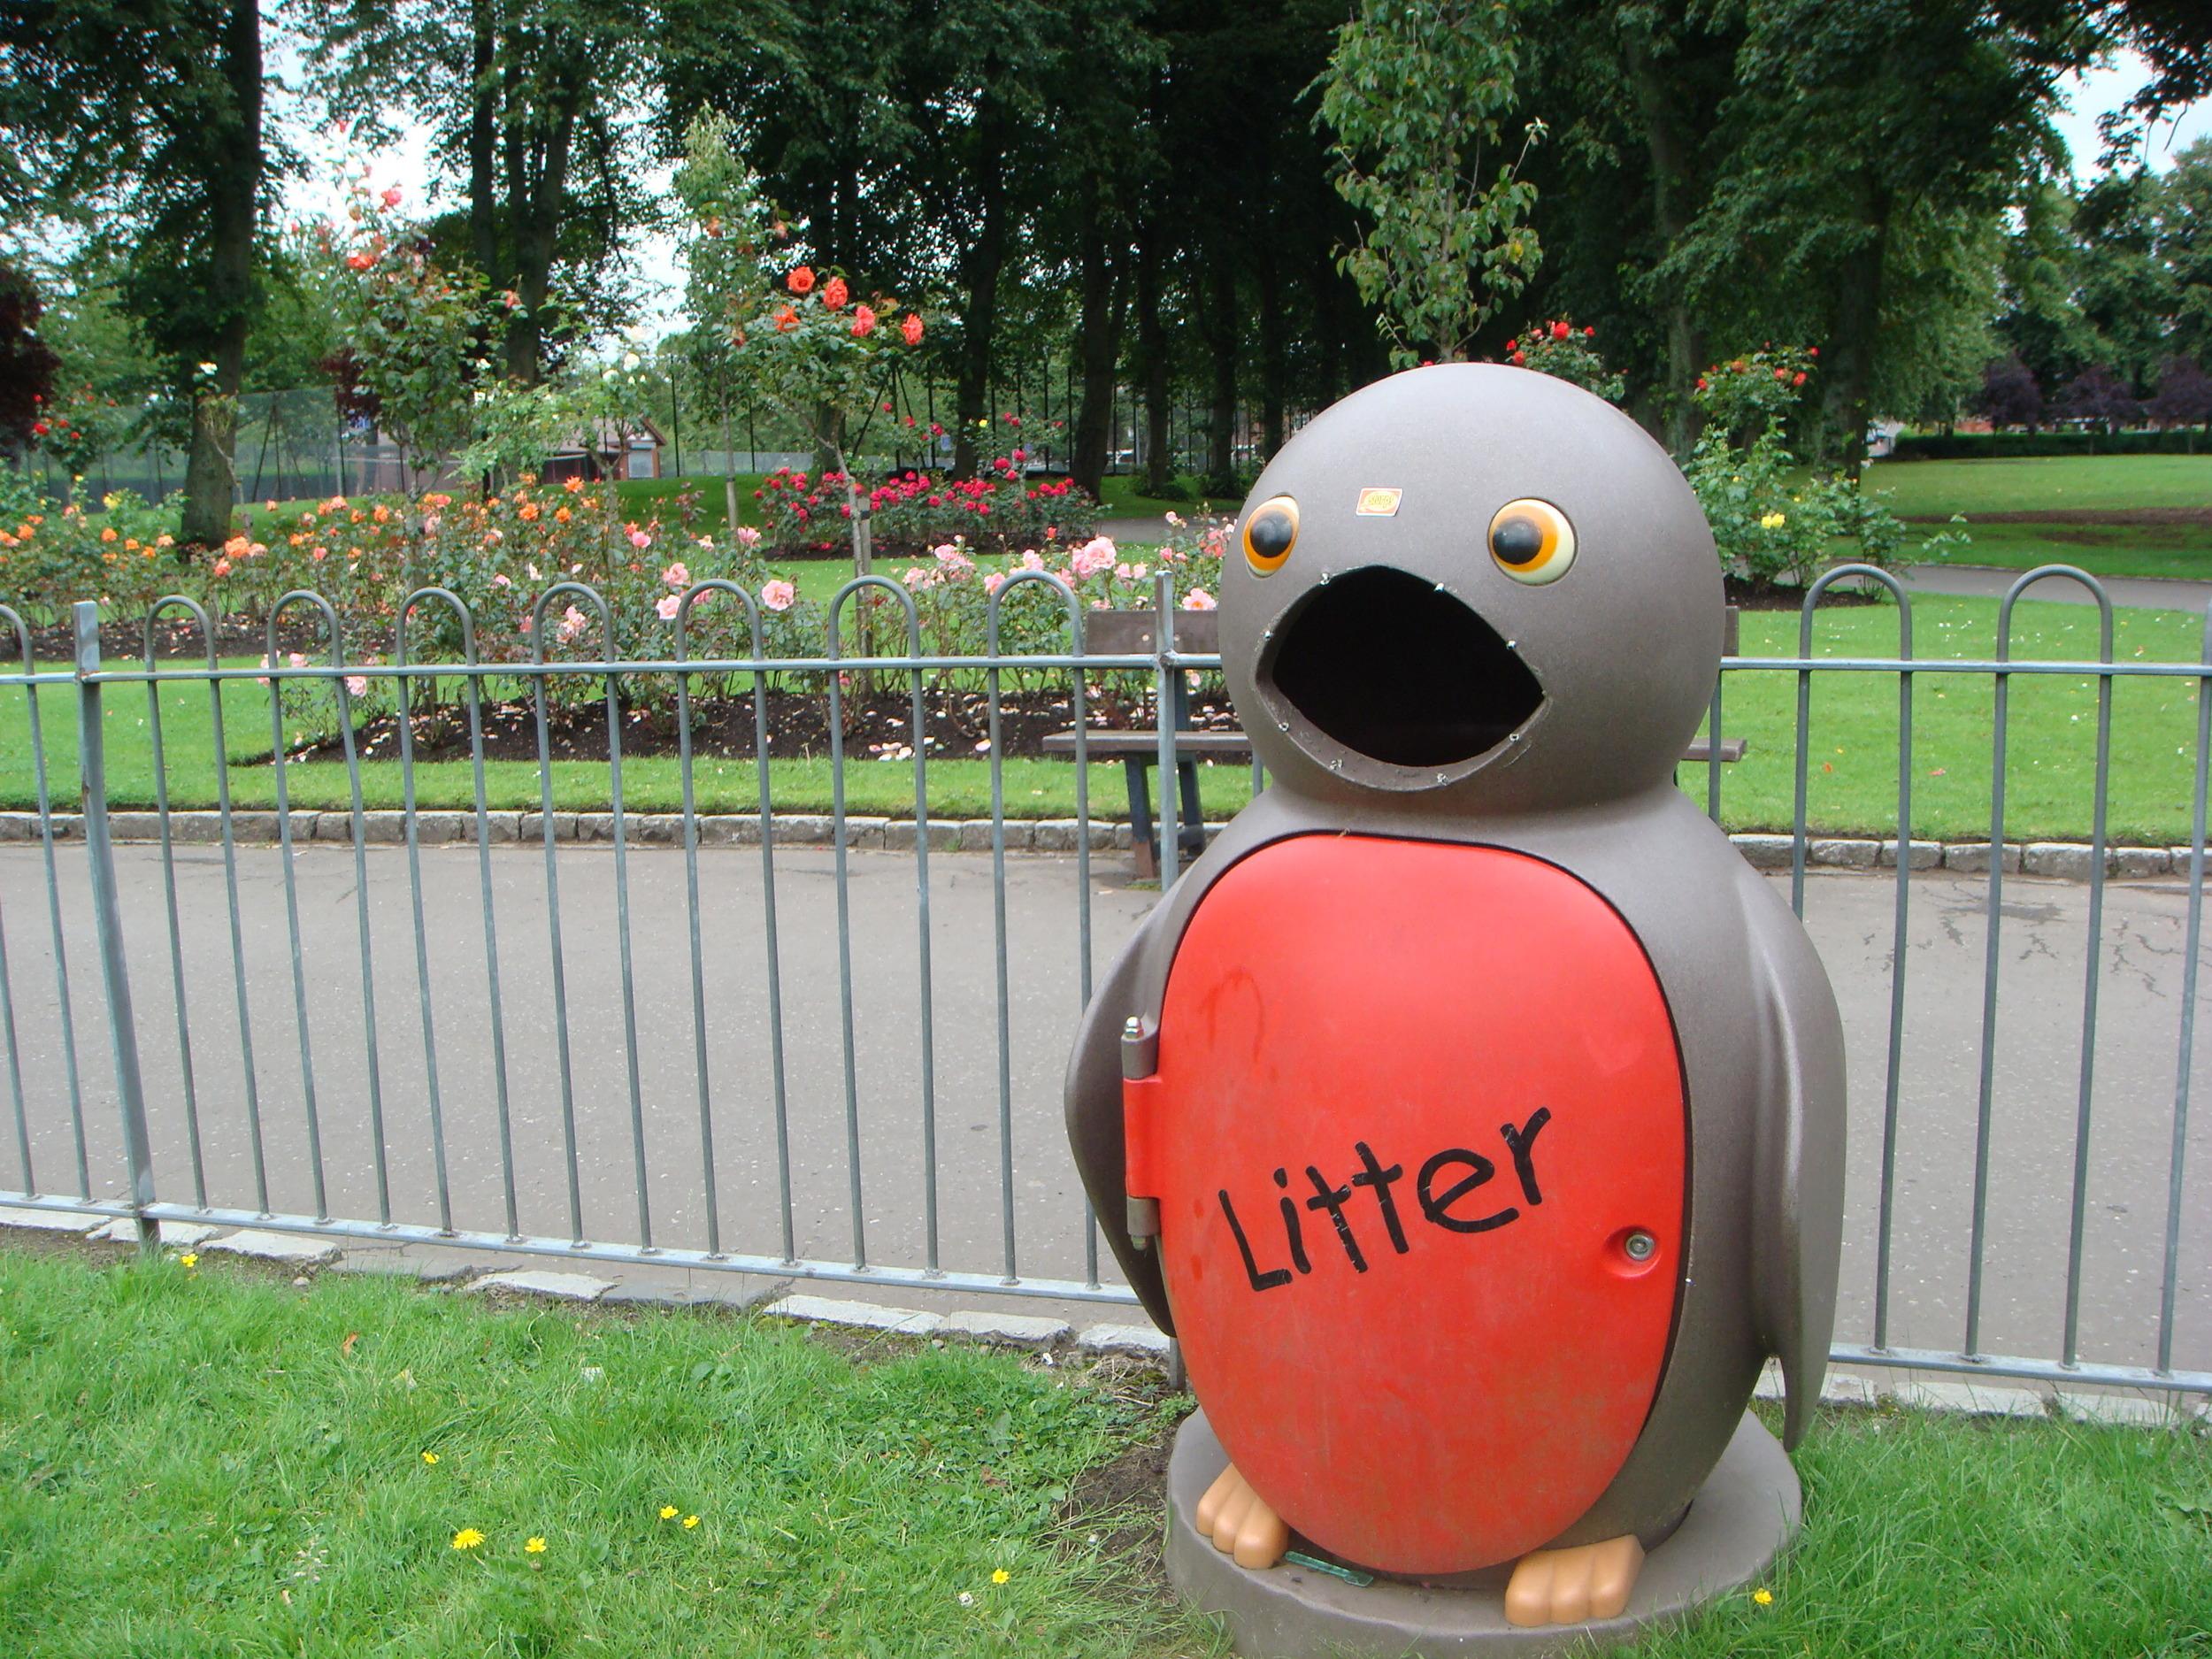 Litter, Glasgow